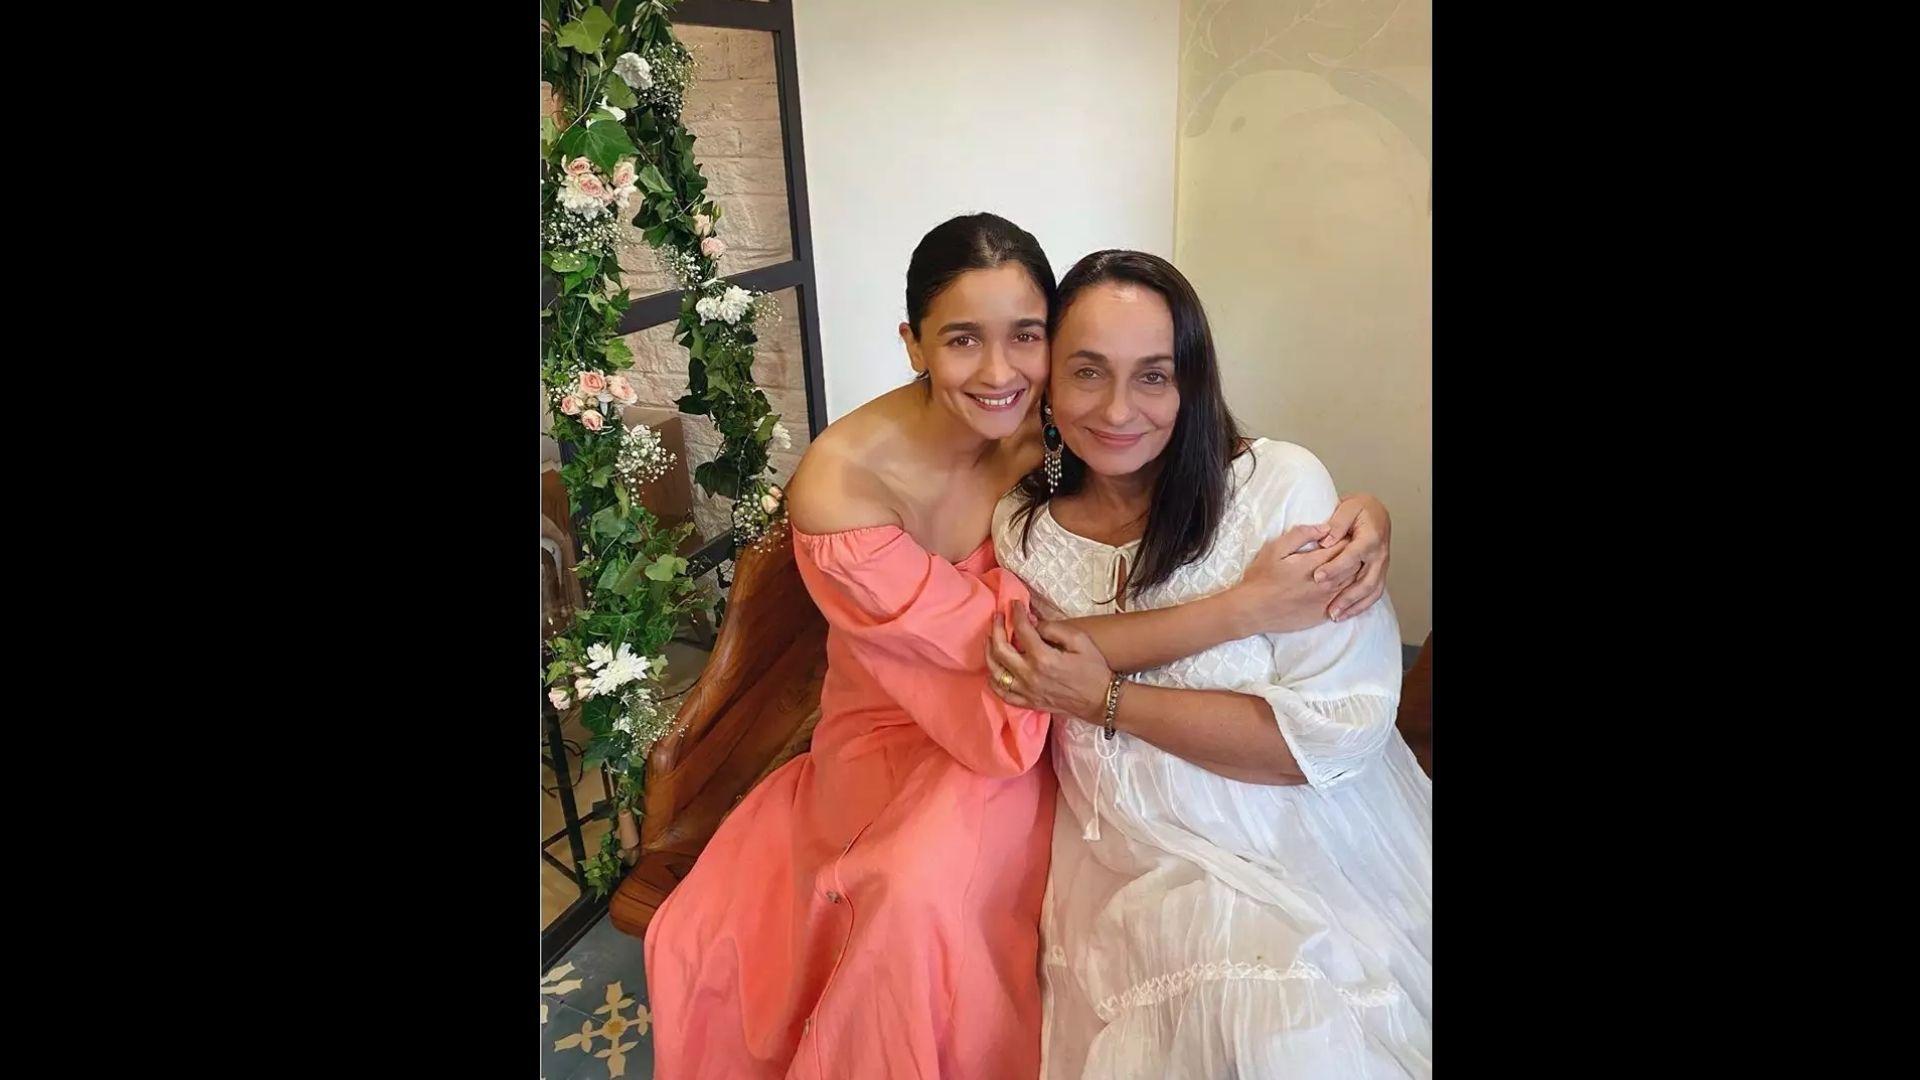 Alia Bhatt Extends Her Kindest Wishes To Mom Soni Razdan On her Birthday Where Soni Looks Ingenuous